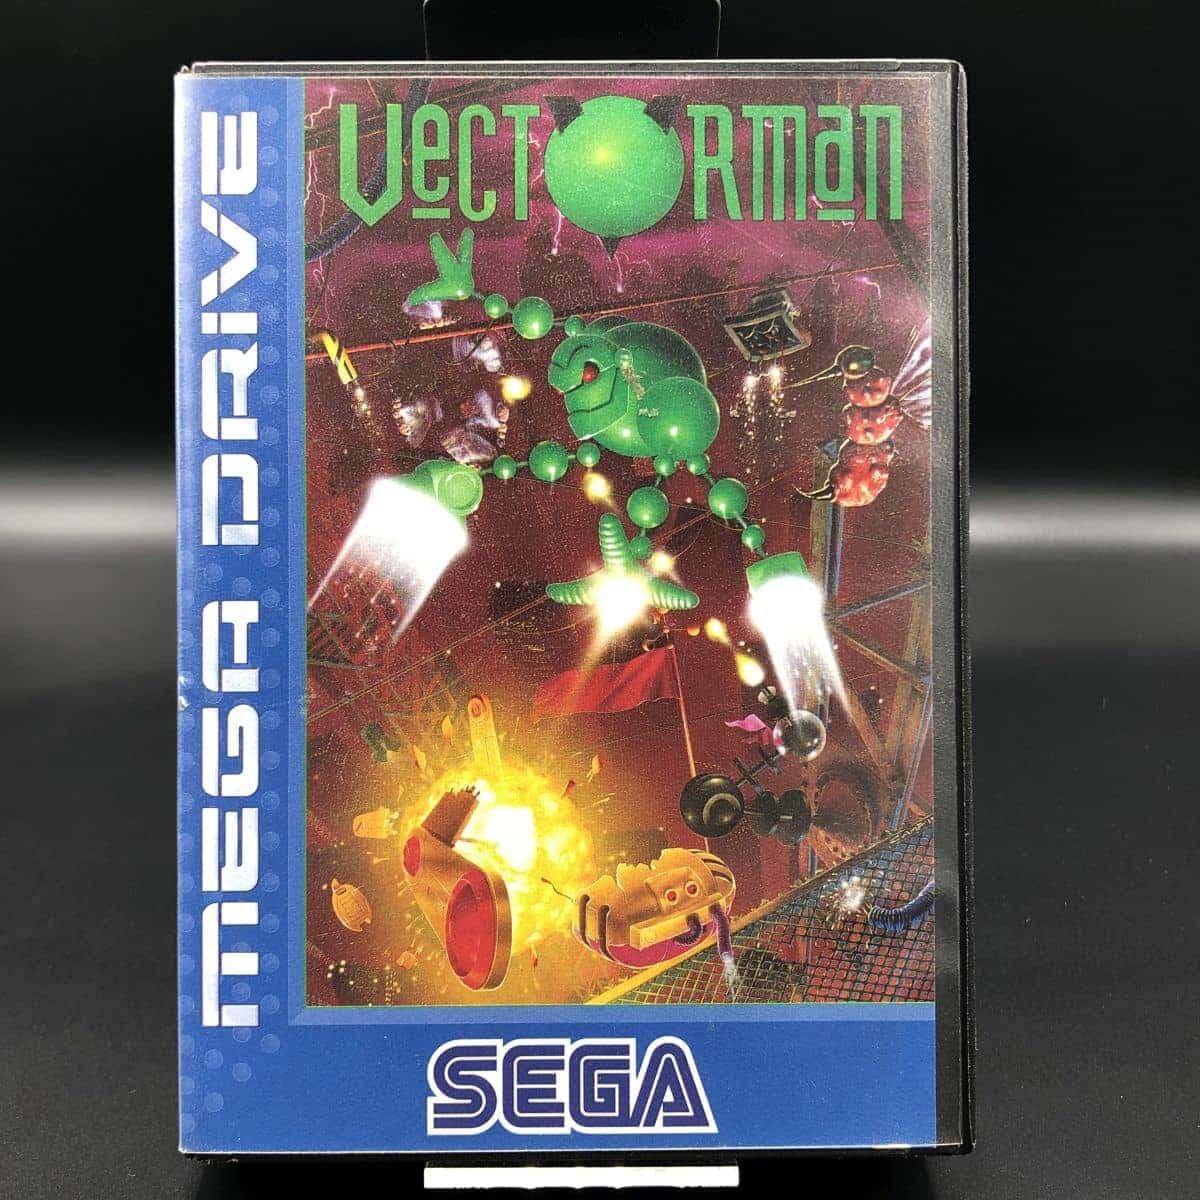 Vectorman (ohne Anleitung) (Sehr gut) Sega Mega Drive